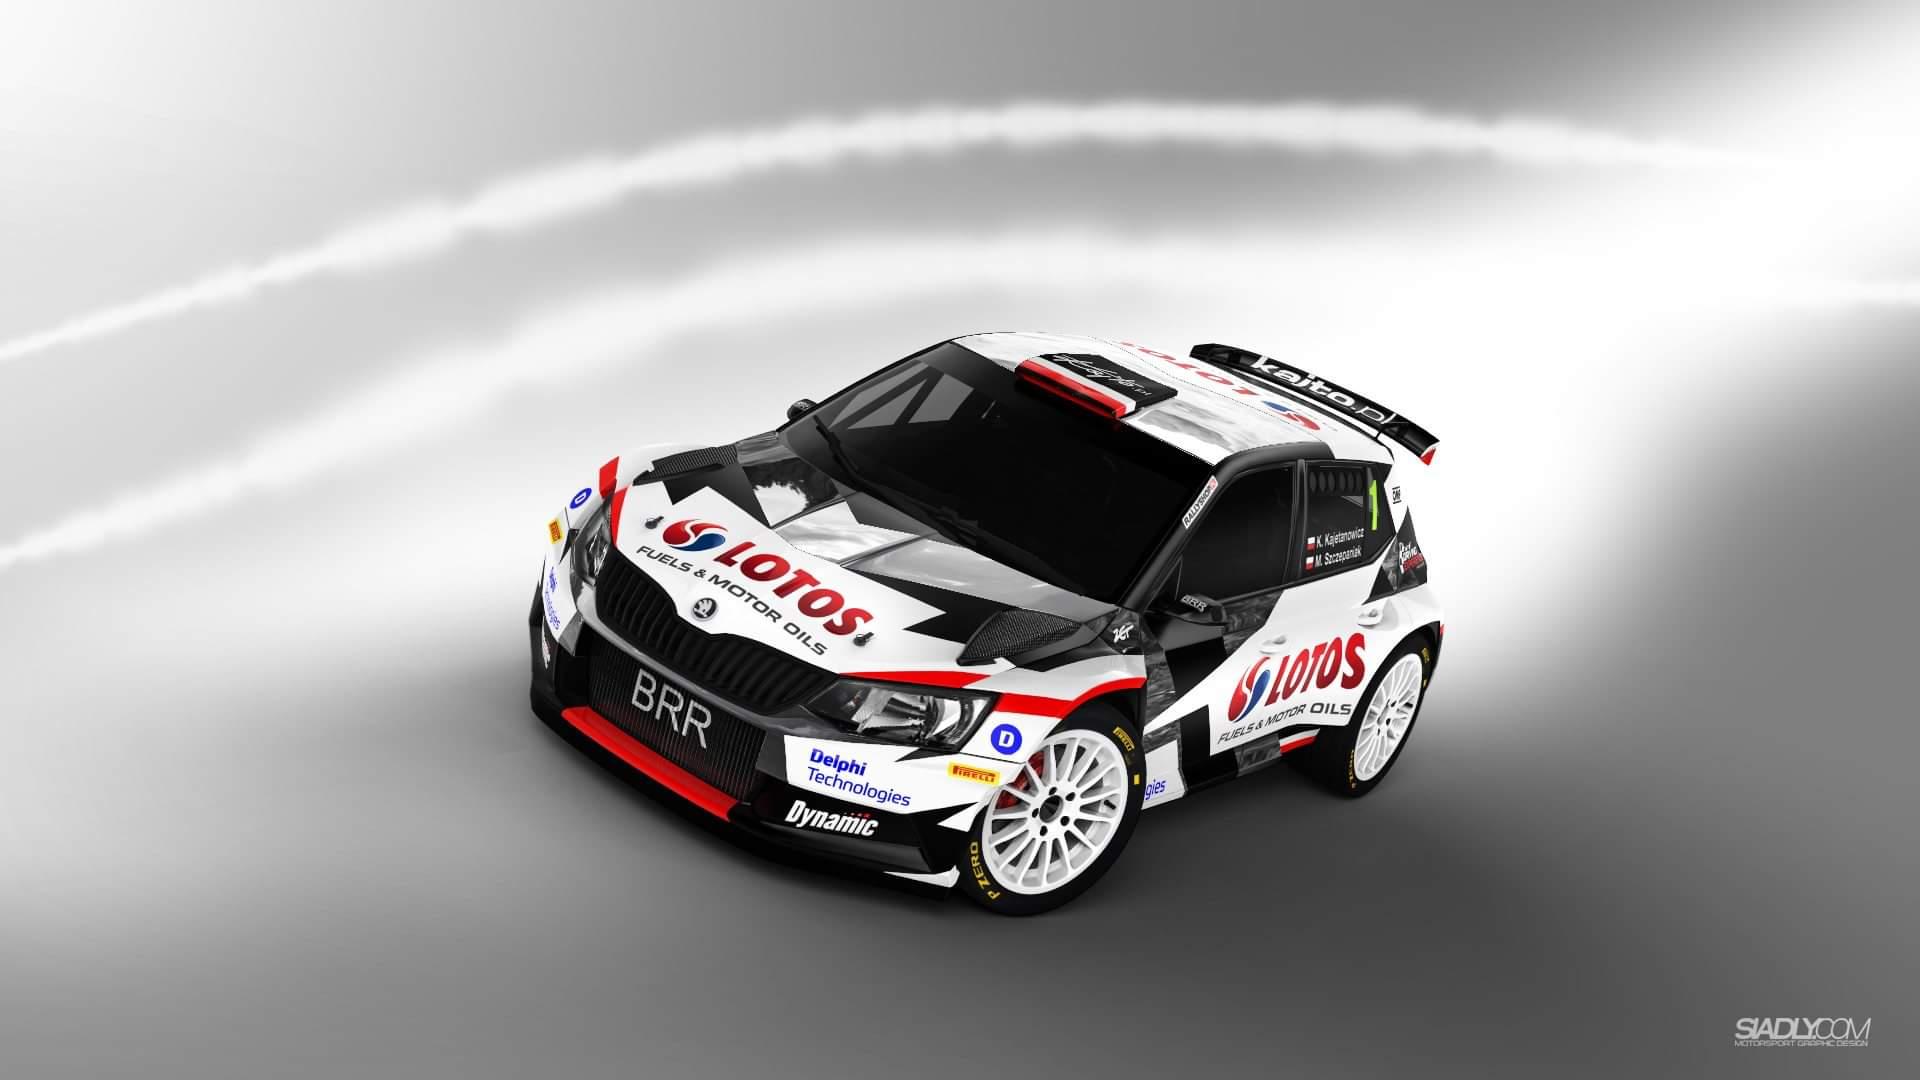 WRC: Rallye d'Italia - Sardegna [13-16 Junio] D8sTtwVXkAARW8-